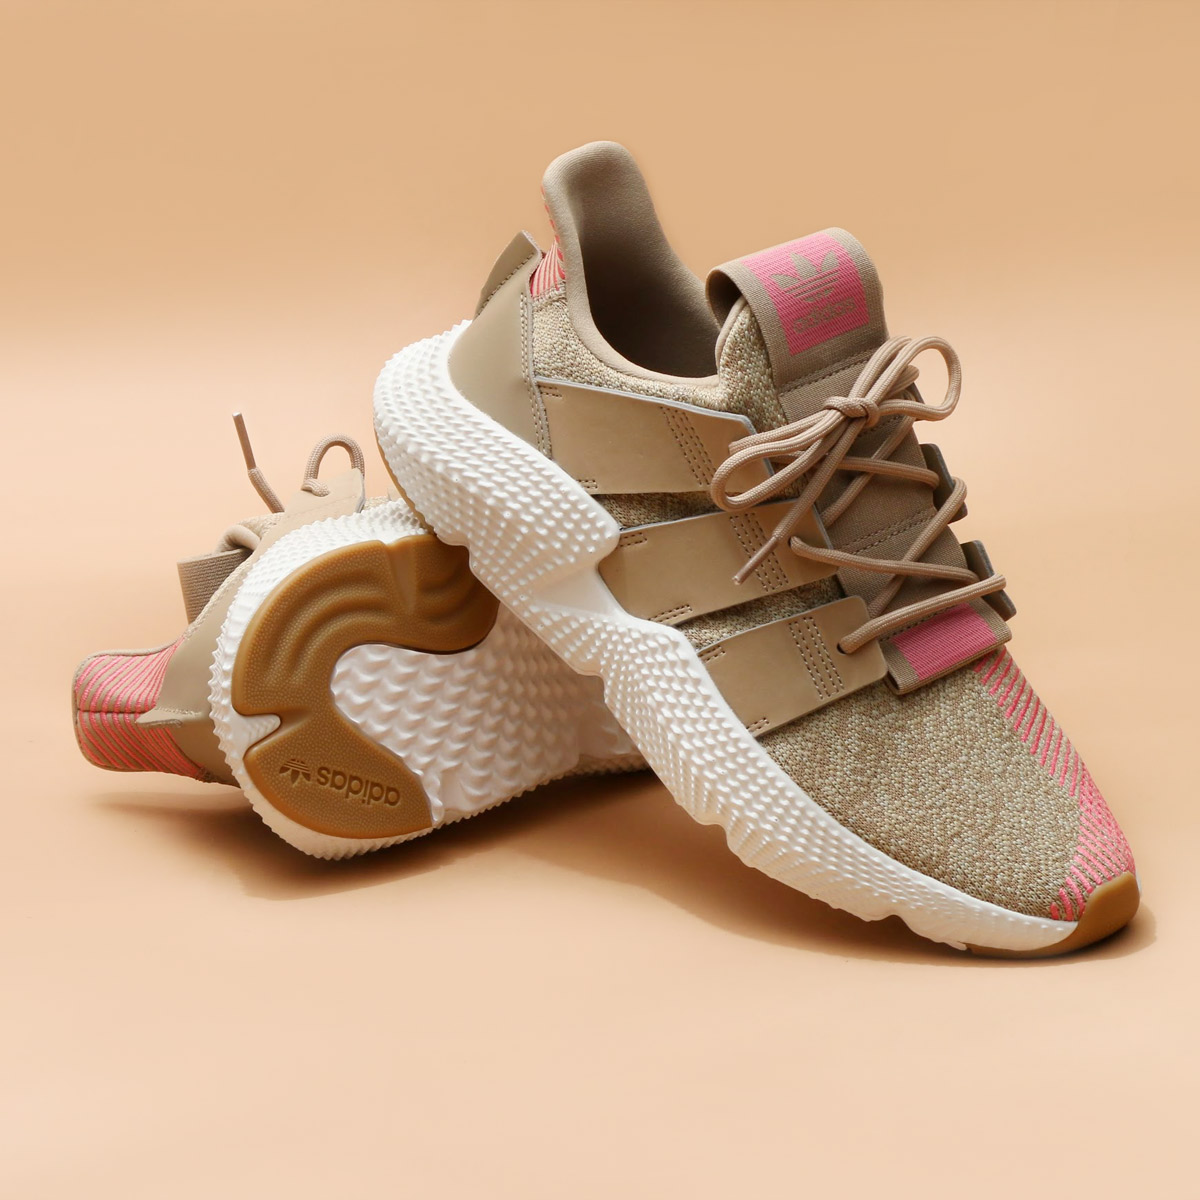 8b42d4ac51c8 atmos pink  adidas Originals PROPHERE (Adidas originals pro Fear) Trace  Khaki Trace Khaki 18SS-I